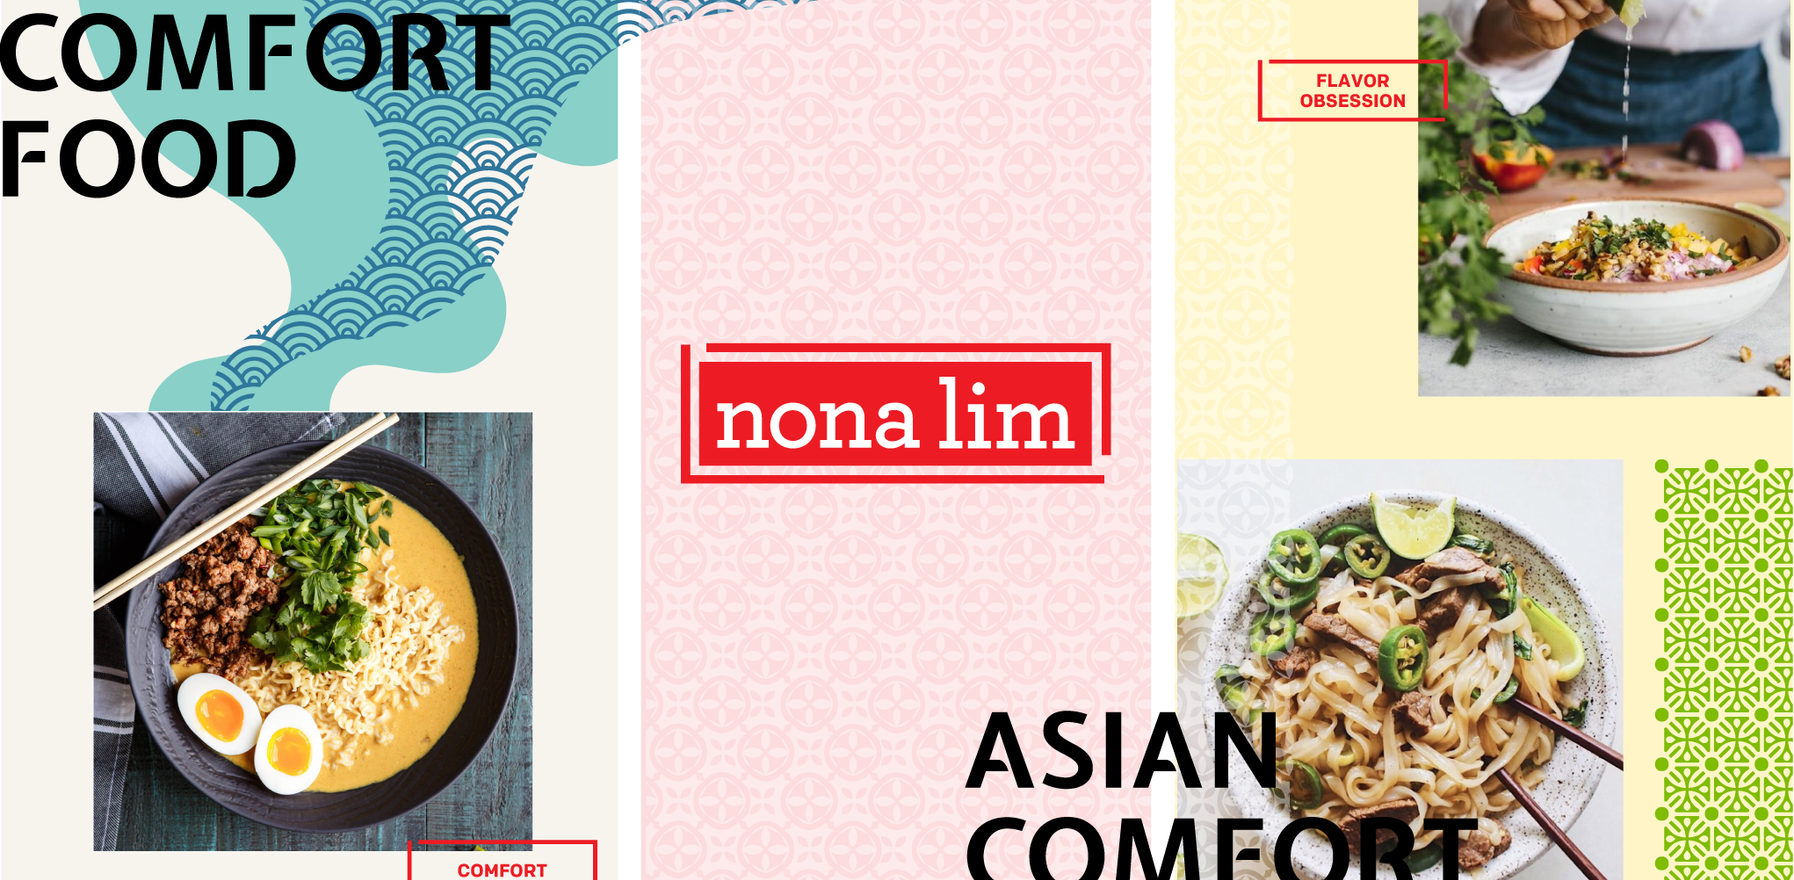 Nona Lim (Click to View)